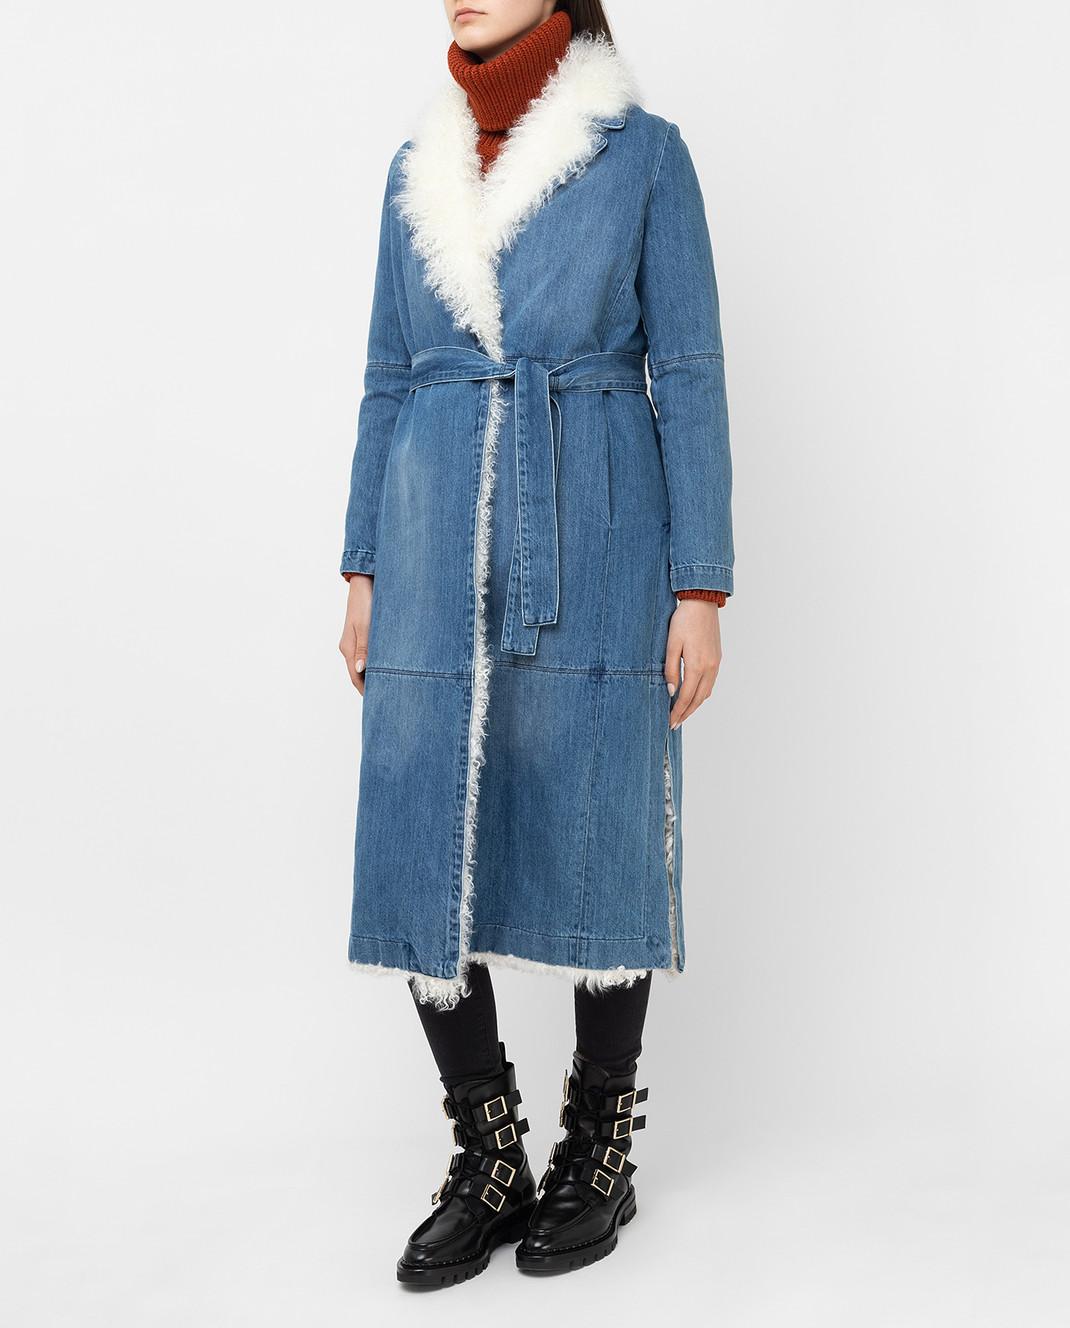 Simonetta Ravizza Синее джинсовое пальто VASIA3 изображение 3